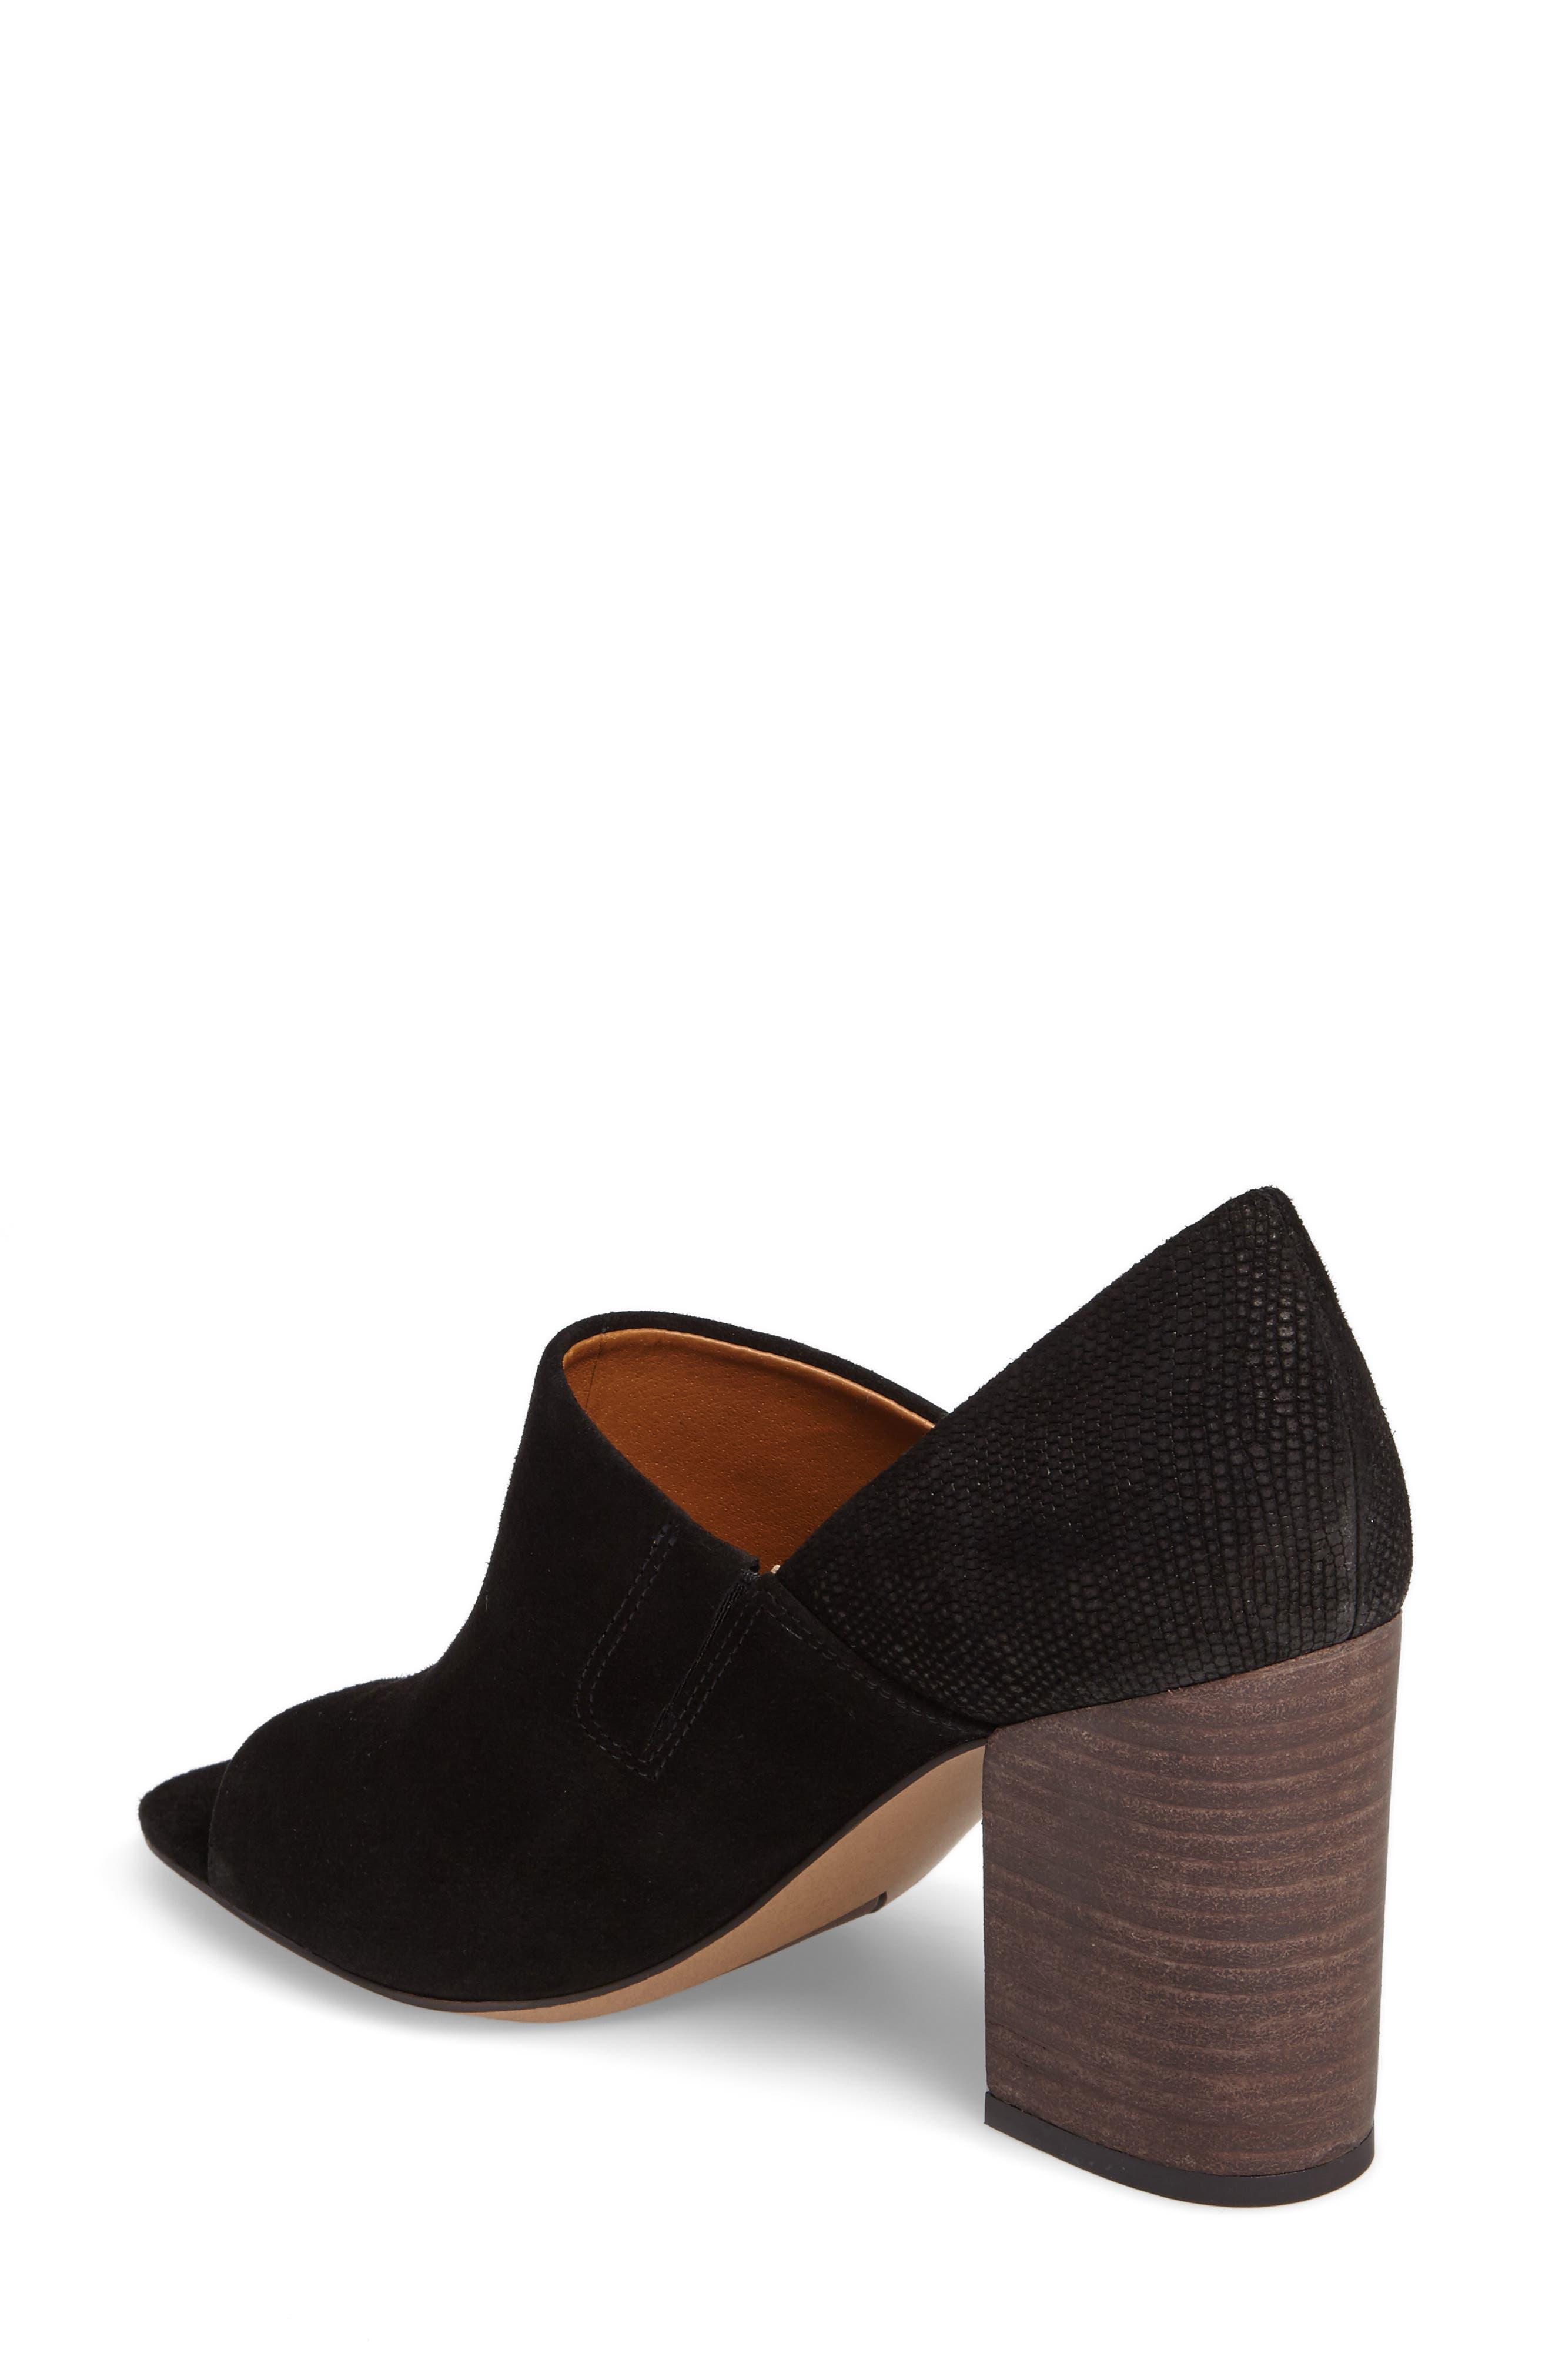 Ellison Block Heel Sandal,                             Alternate thumbnail 4, color,